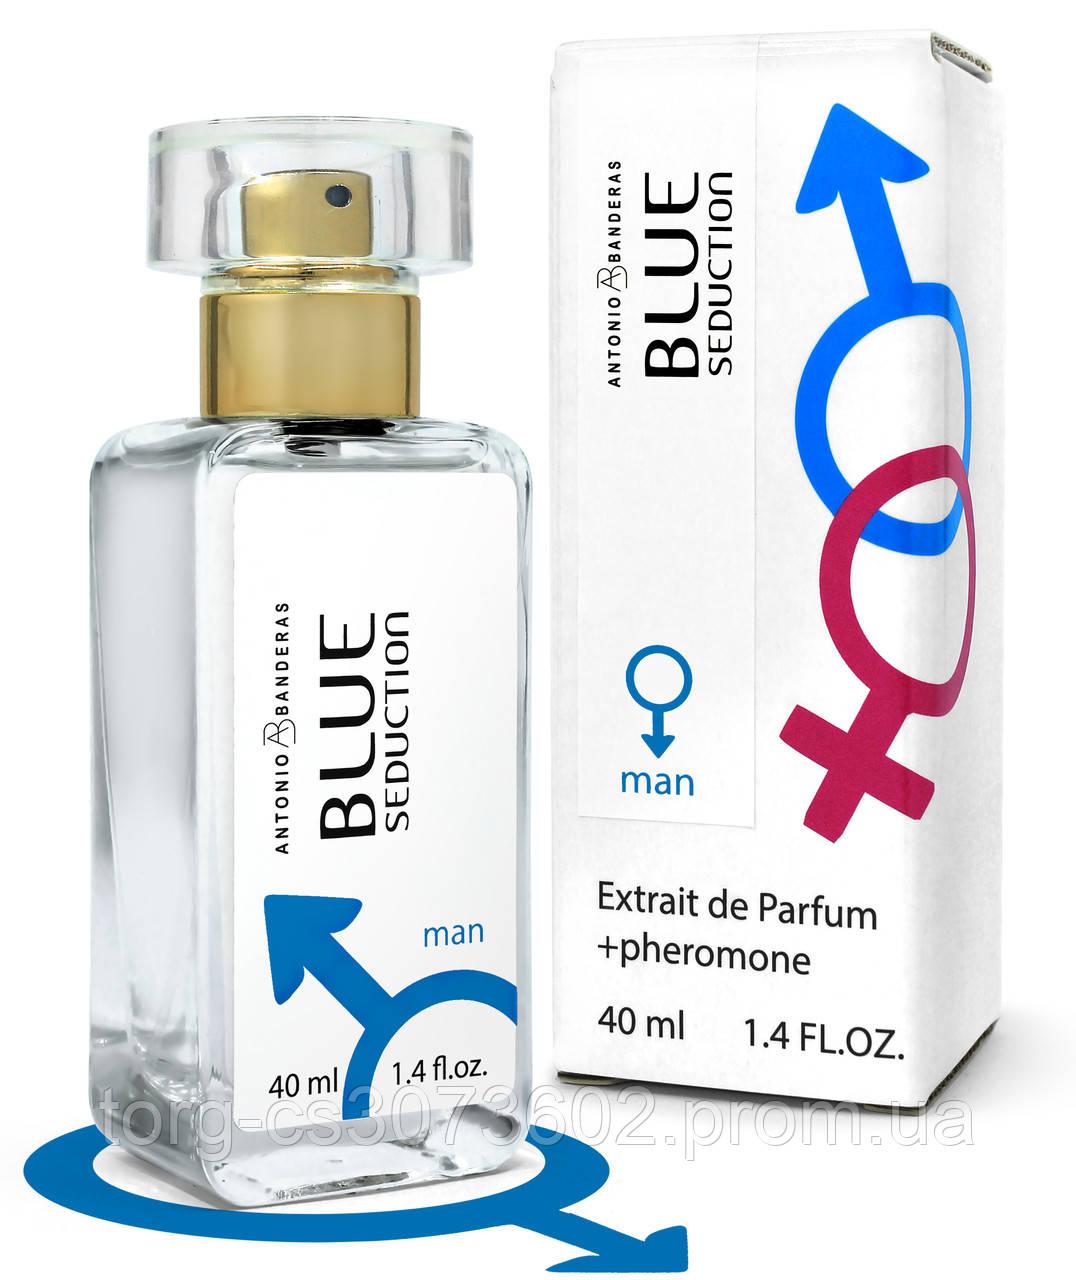 Тестер Pheromone мужской Antonio Banderas Blue Seduction for Men, 40 мл.